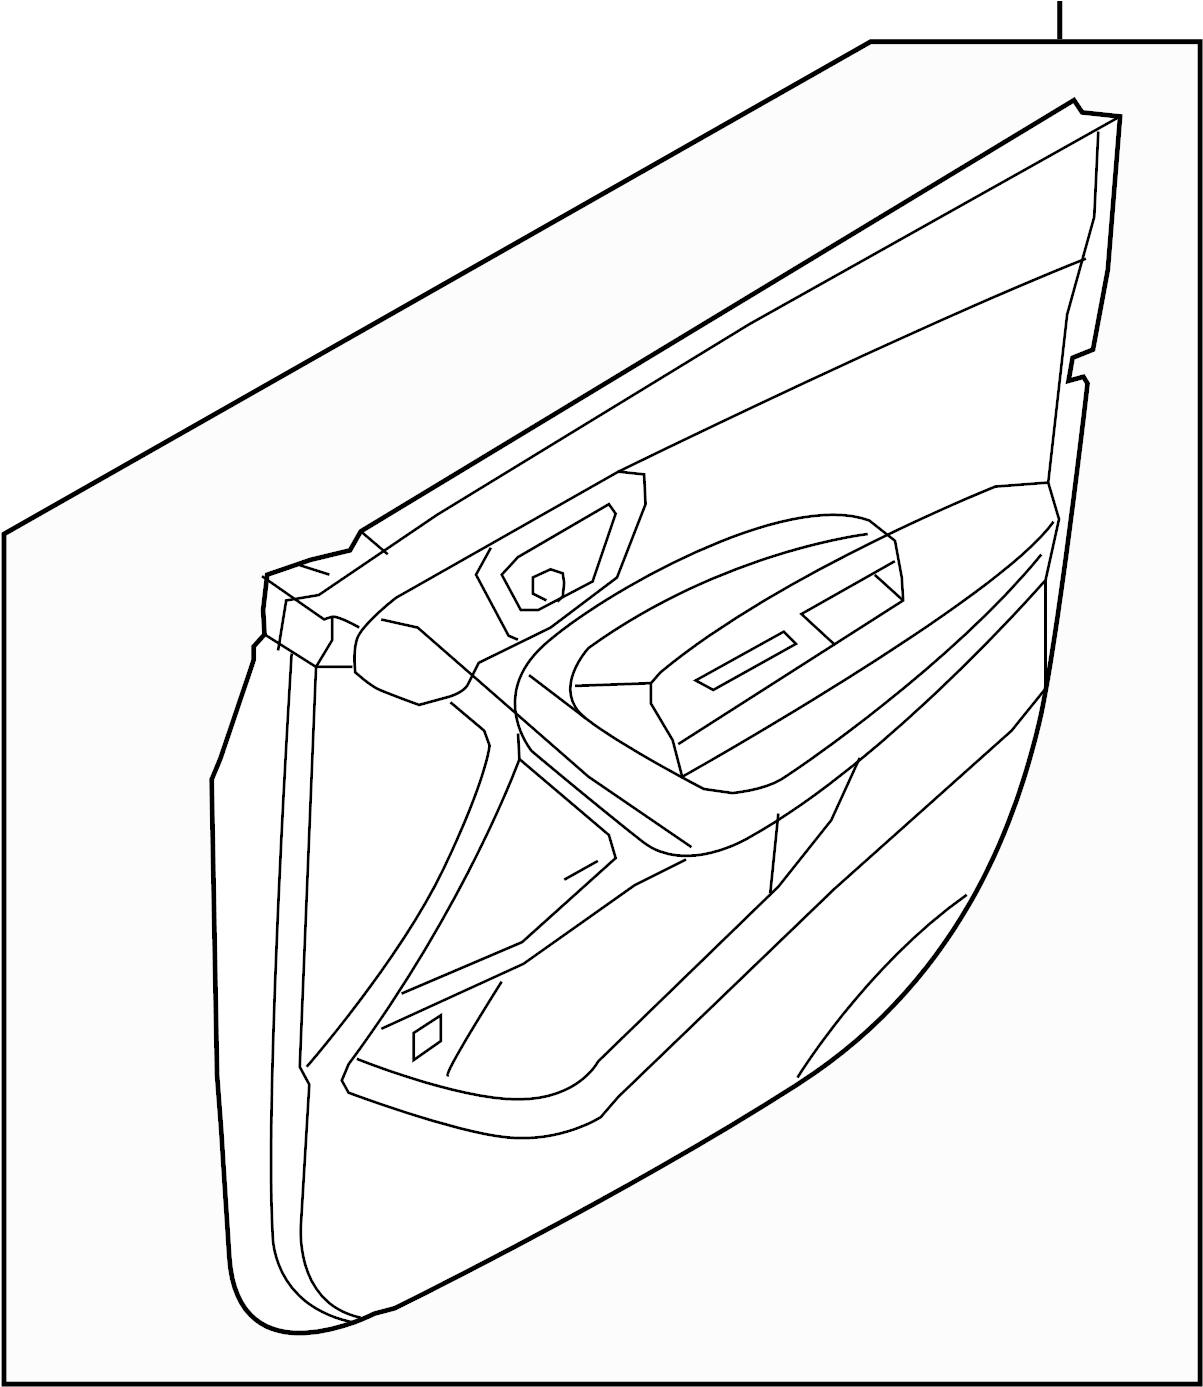 2015 Hyundai Santa Fe Door Interior Trim Panel. Door trim